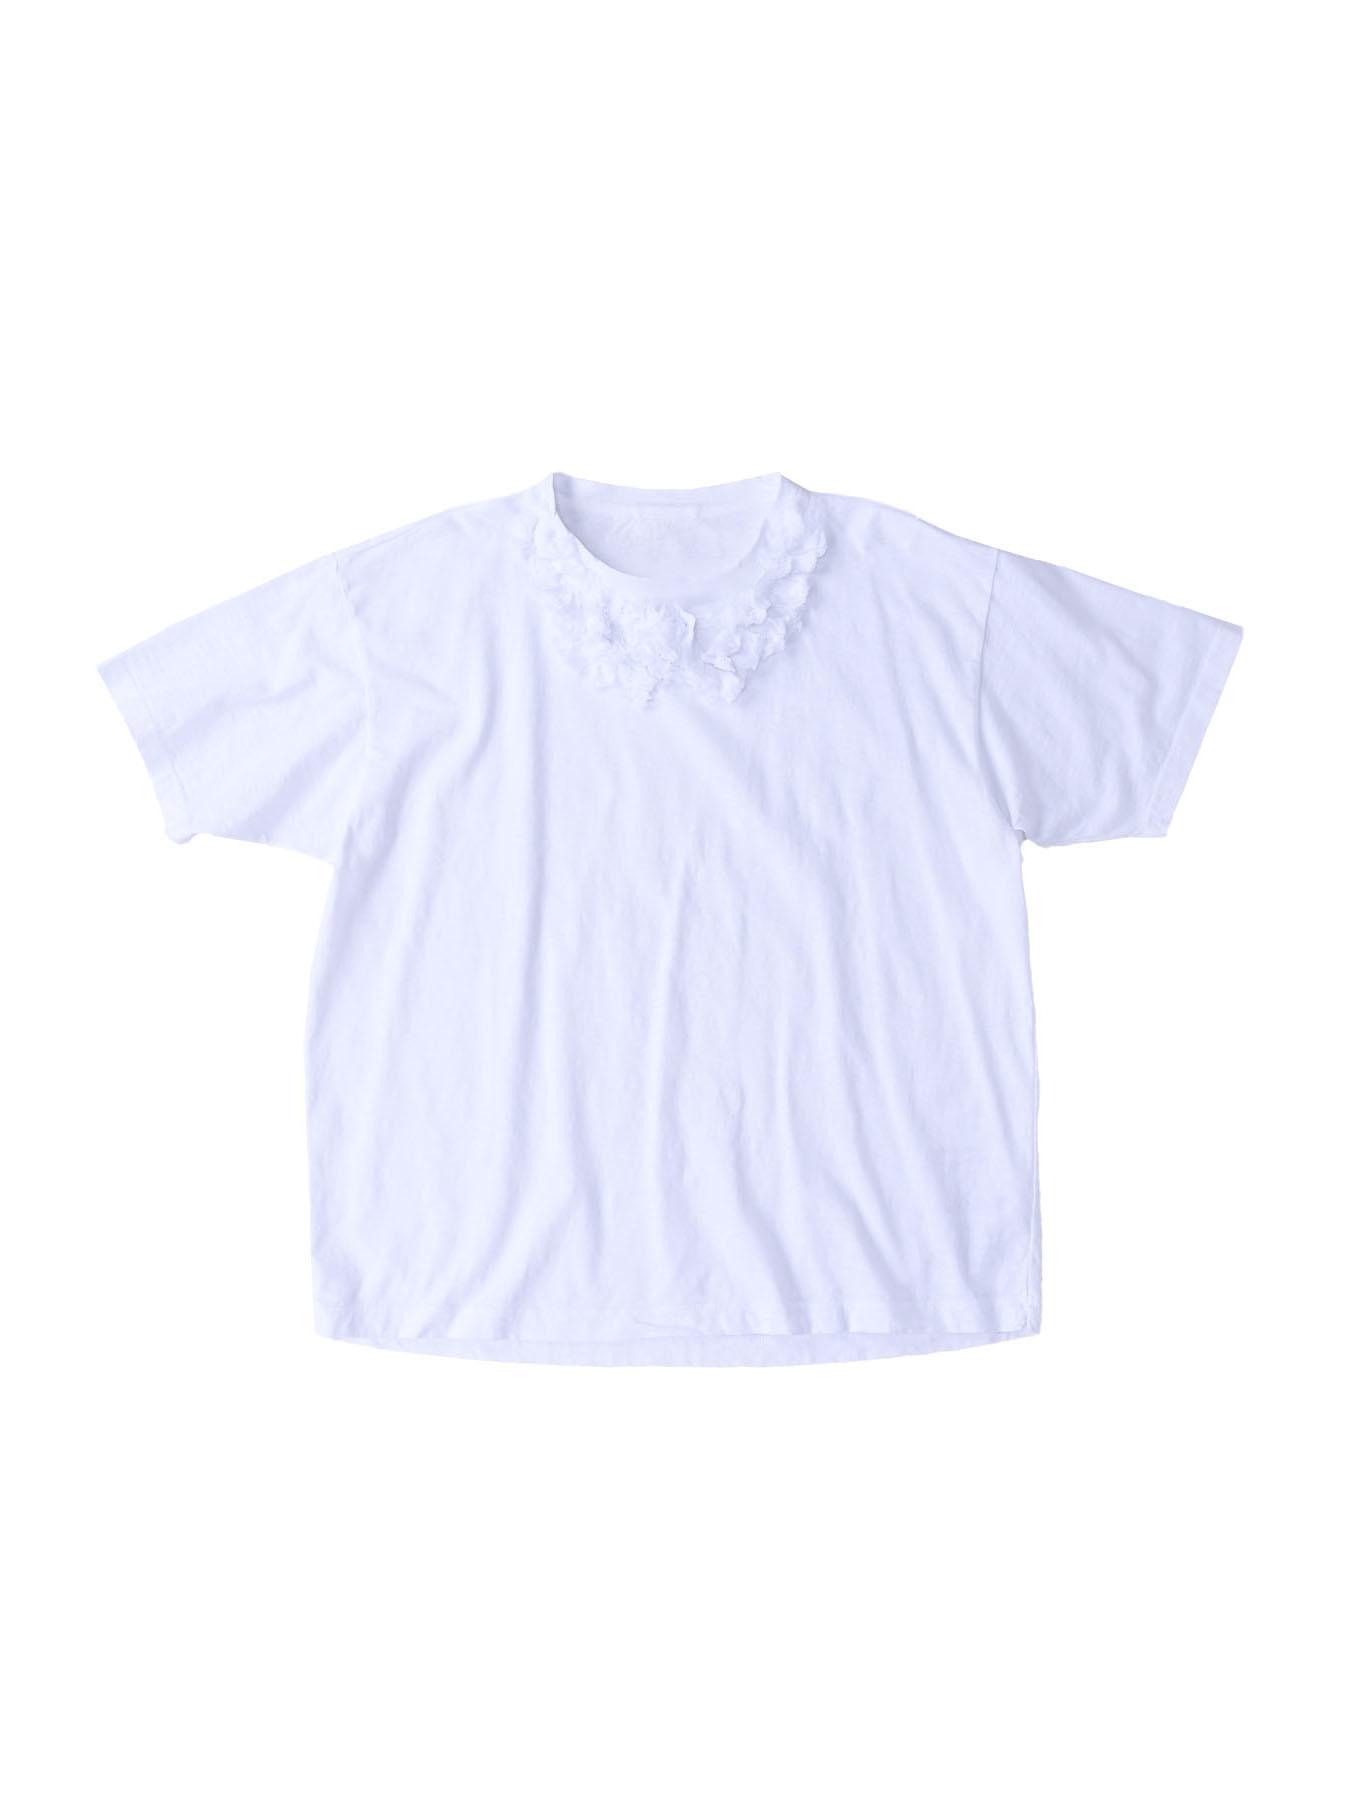 Lei Frill Ocean T-shirt (0621)-1